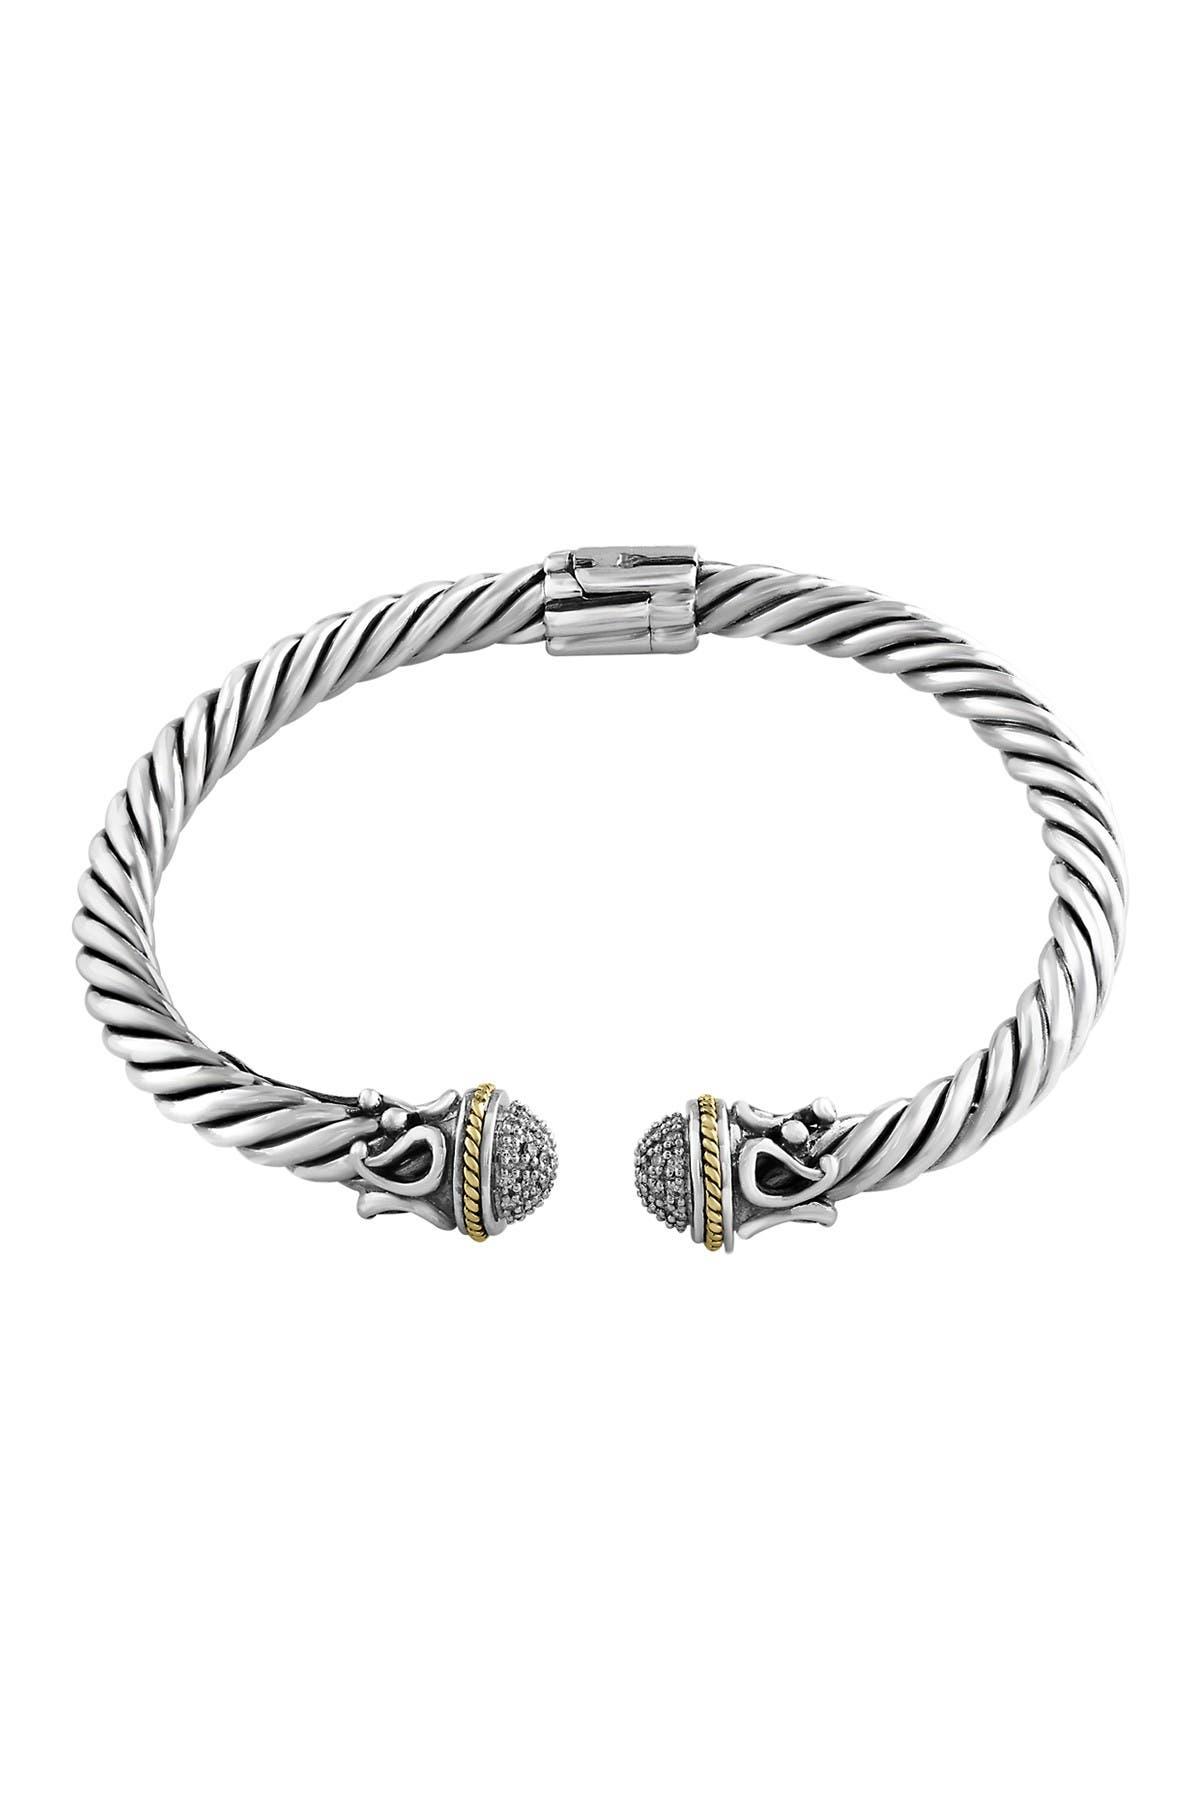 Image of Effy Sterling Silver & 18K Yellow Gold Pave Diamond Cuff Bracelet - 0.26 ctw